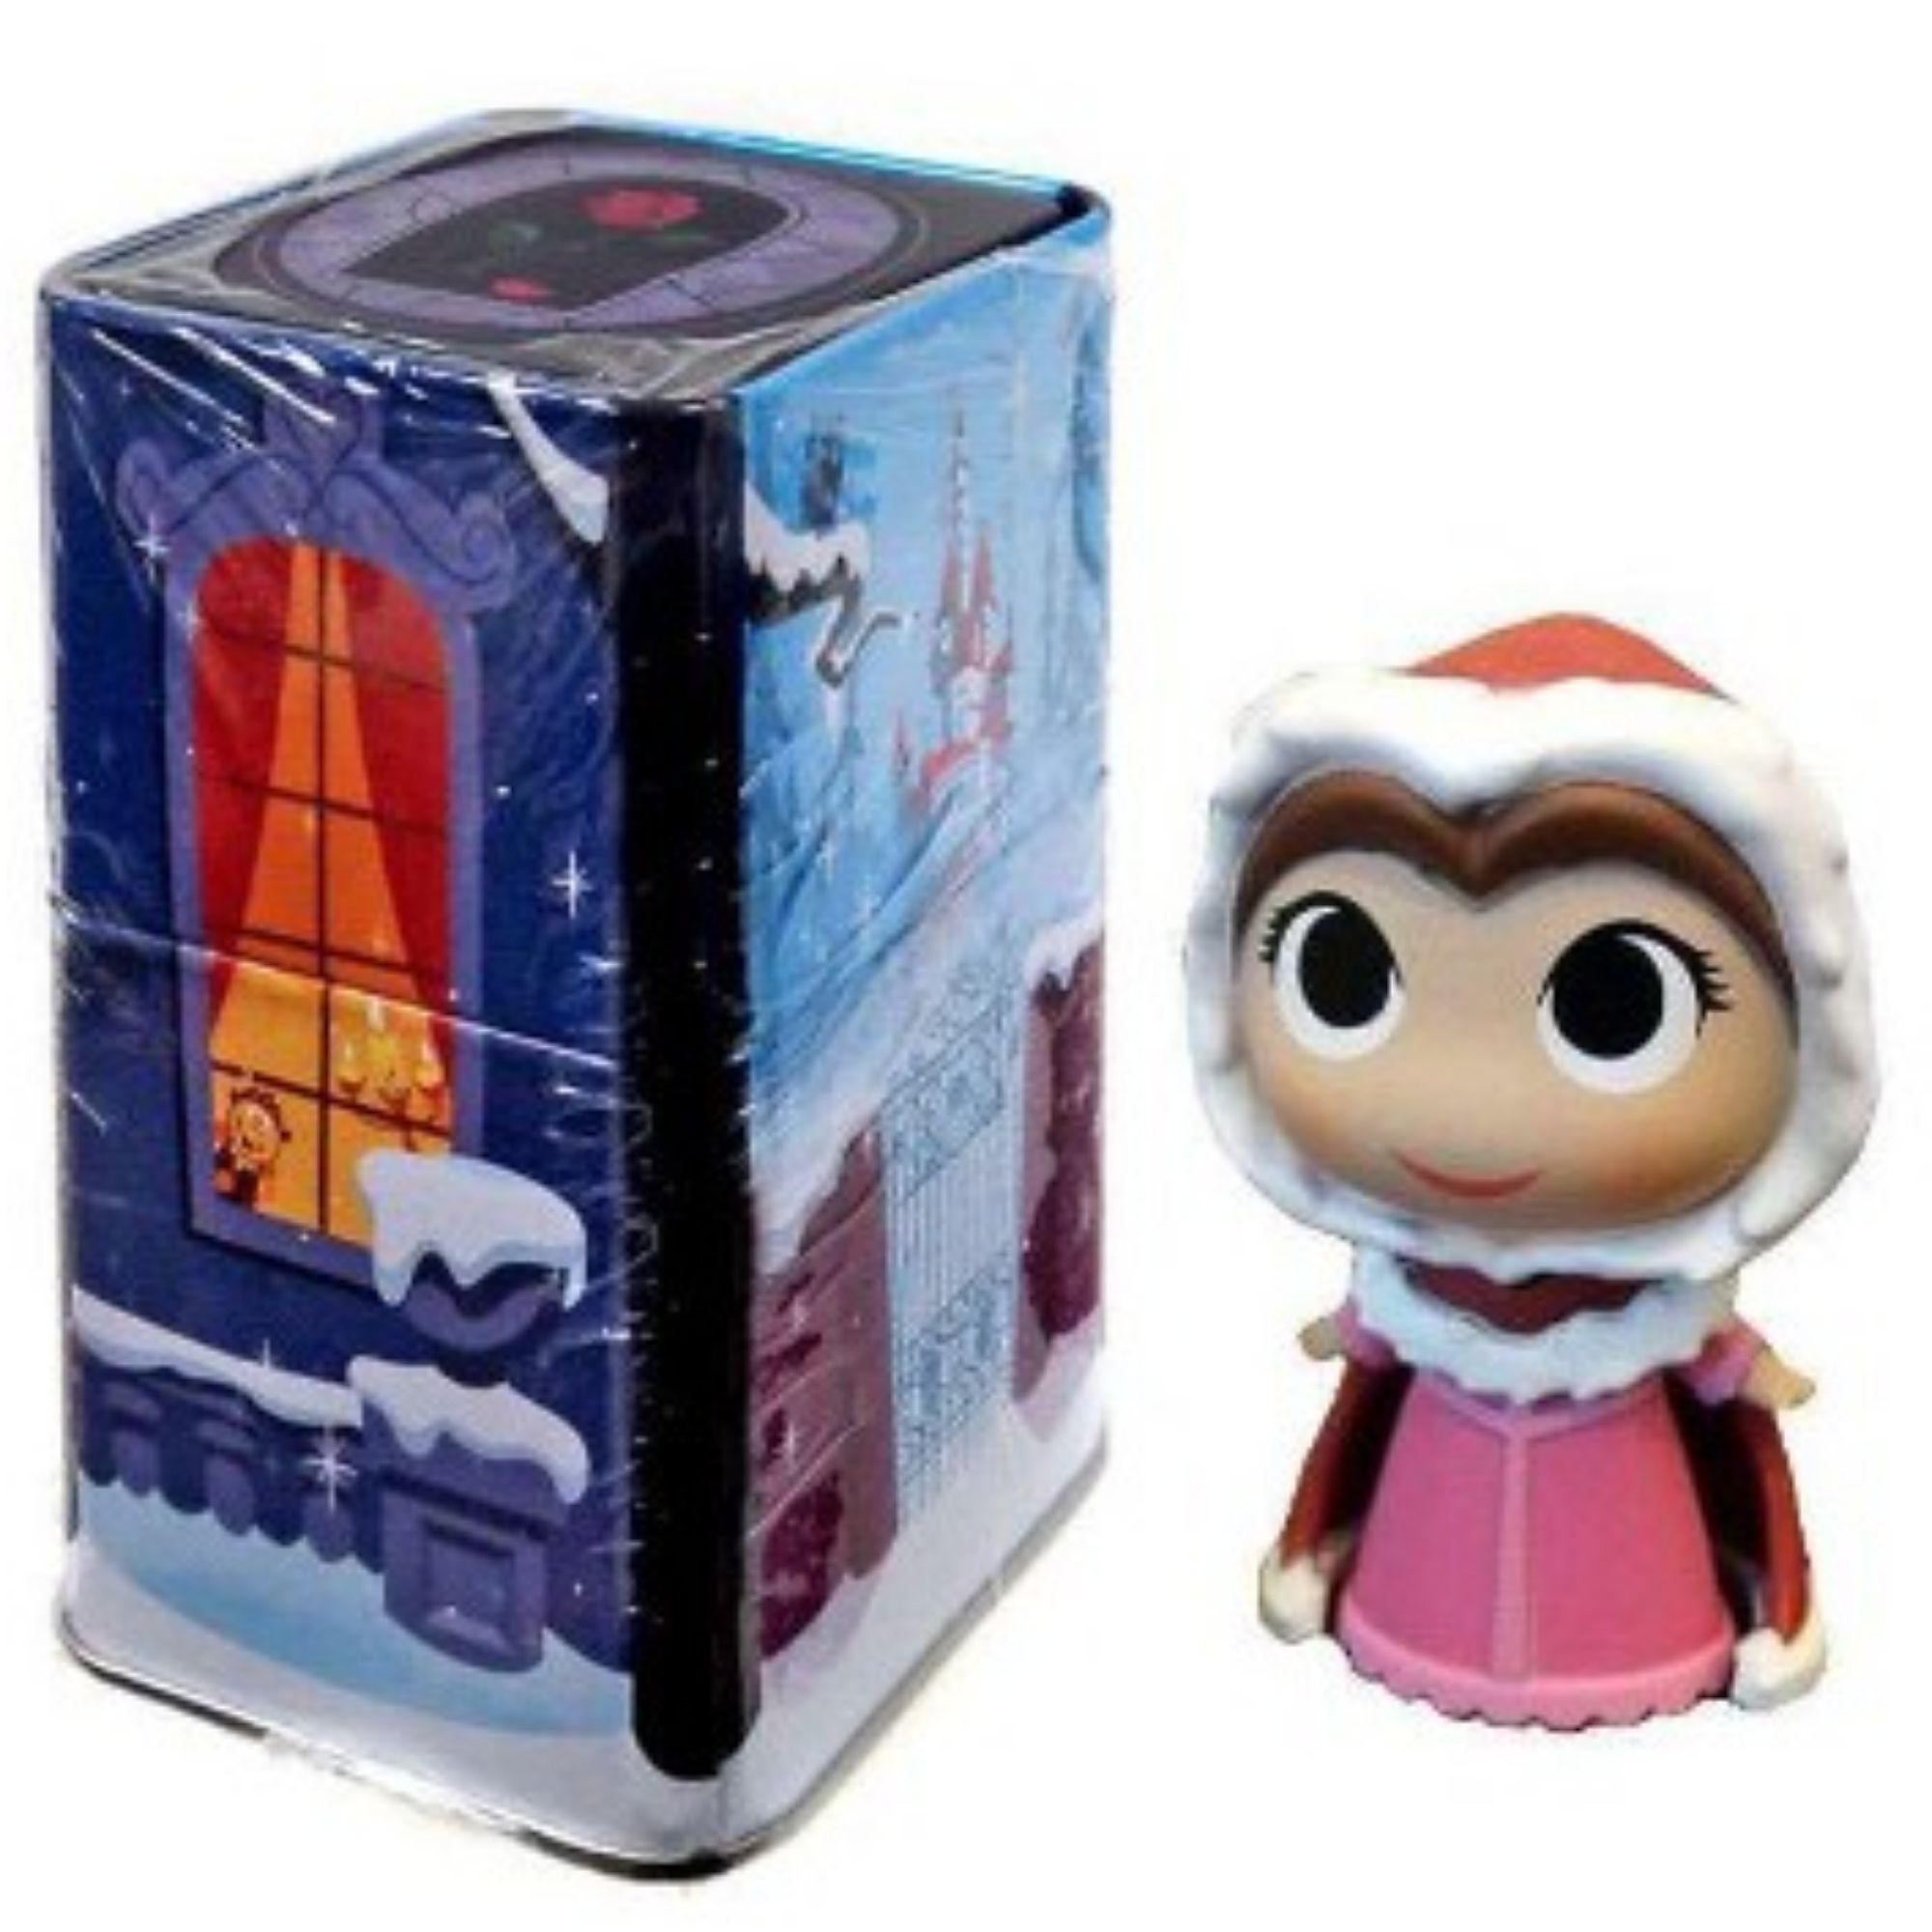 Mini Mystery Funko Disney Treausure Bela da Bela e a Fera  - Game Land Brinquedos